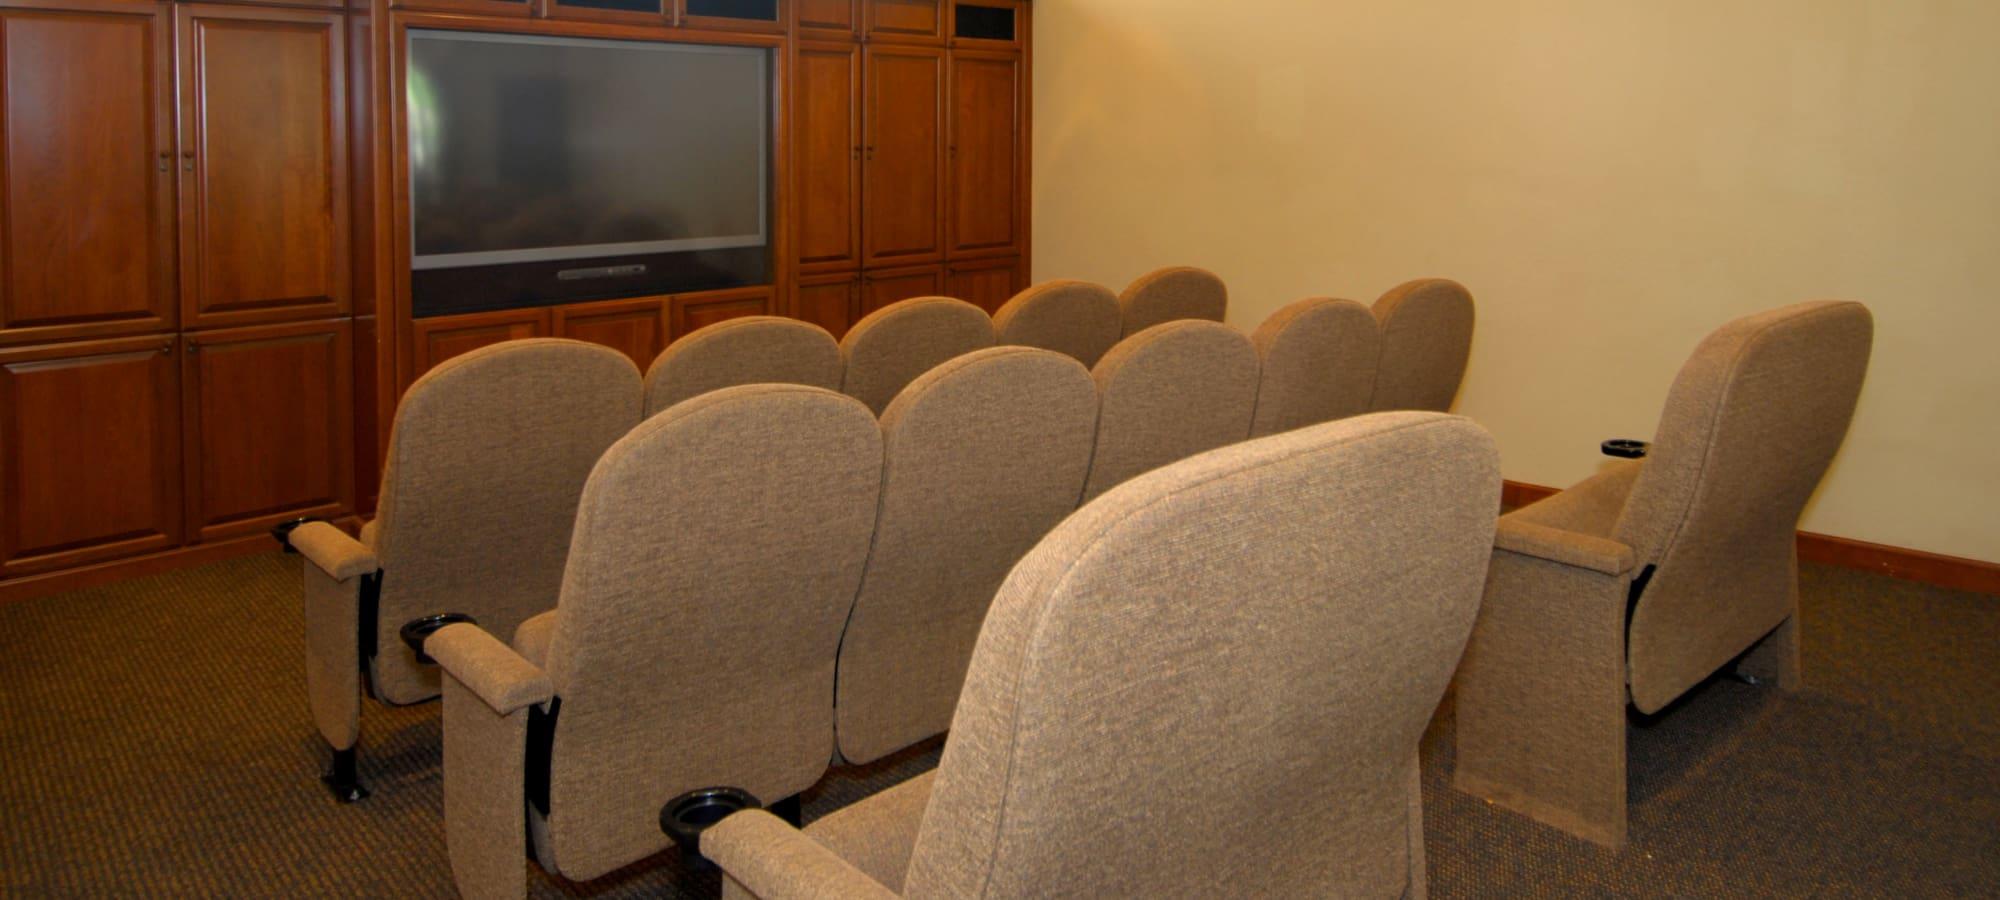 Mini theater room at Remington Ranch in Litchfield Park, Arizona